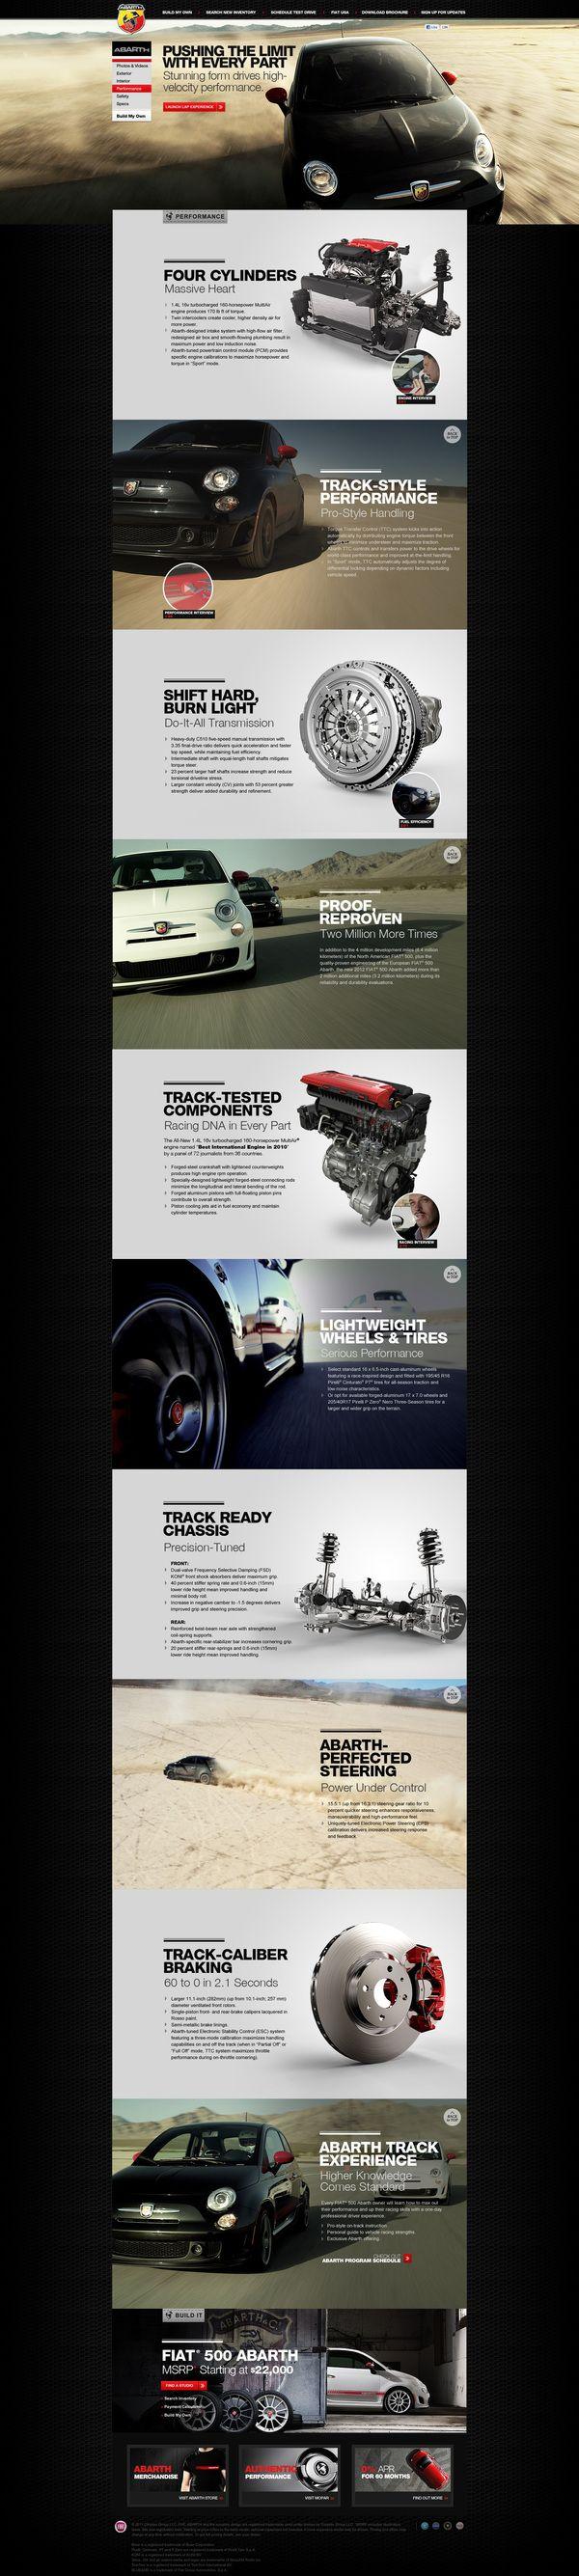 Fiat 500 Abarth Website Design by Antonio Caballero, via Behance